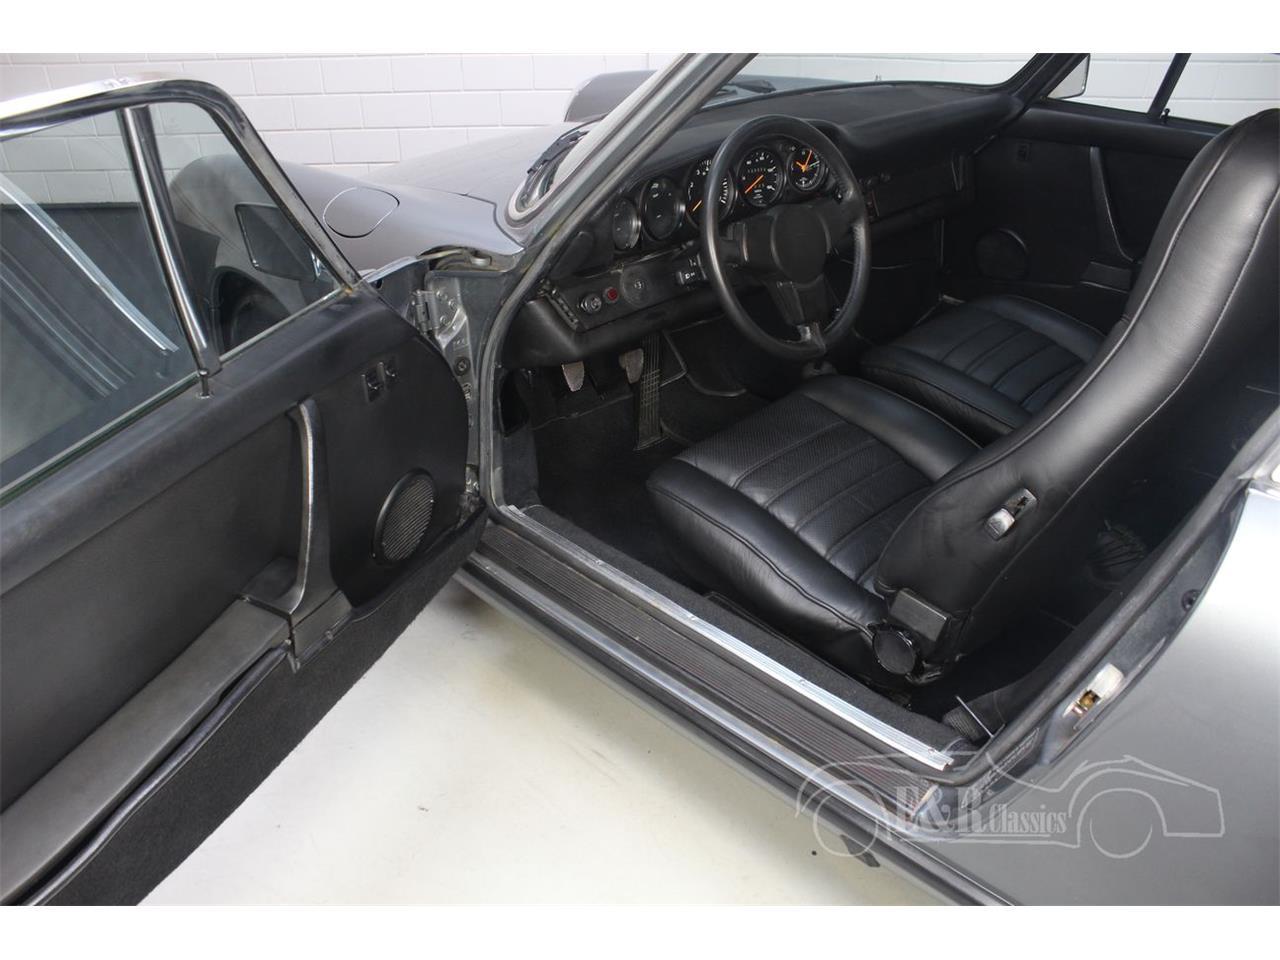 Large Picture of 1976 Porsche 912E located in Waalwijk Noord-Brabant - $44,700.00 - Q66S